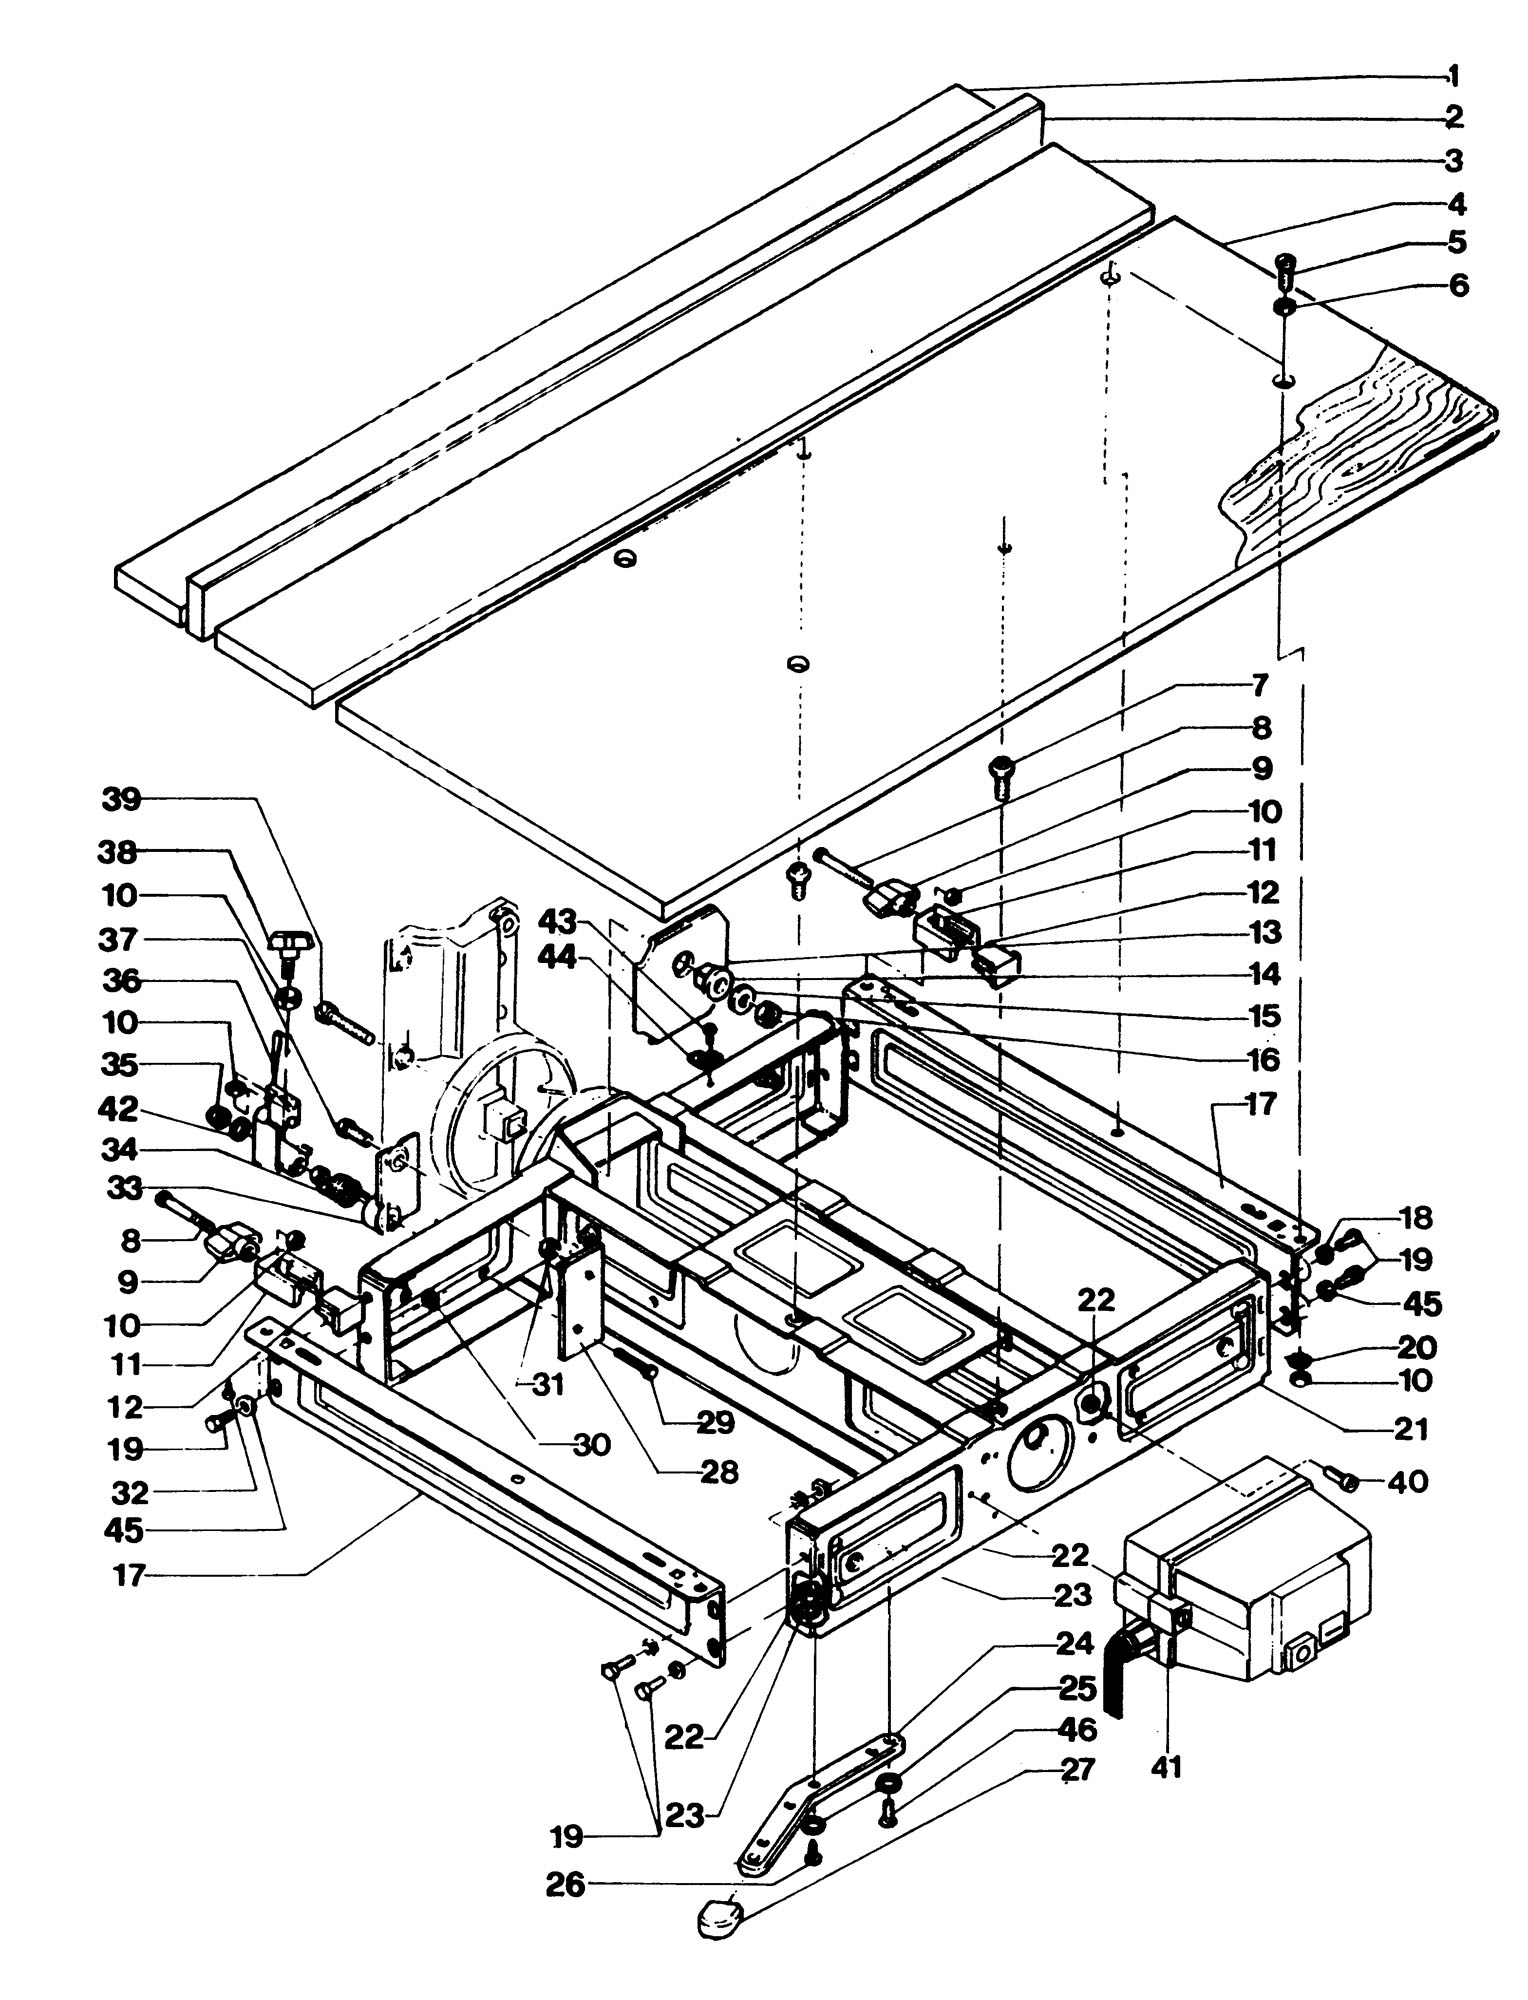 Spares for Dewalt Dw1201----d Radial Arm Saw (type 1